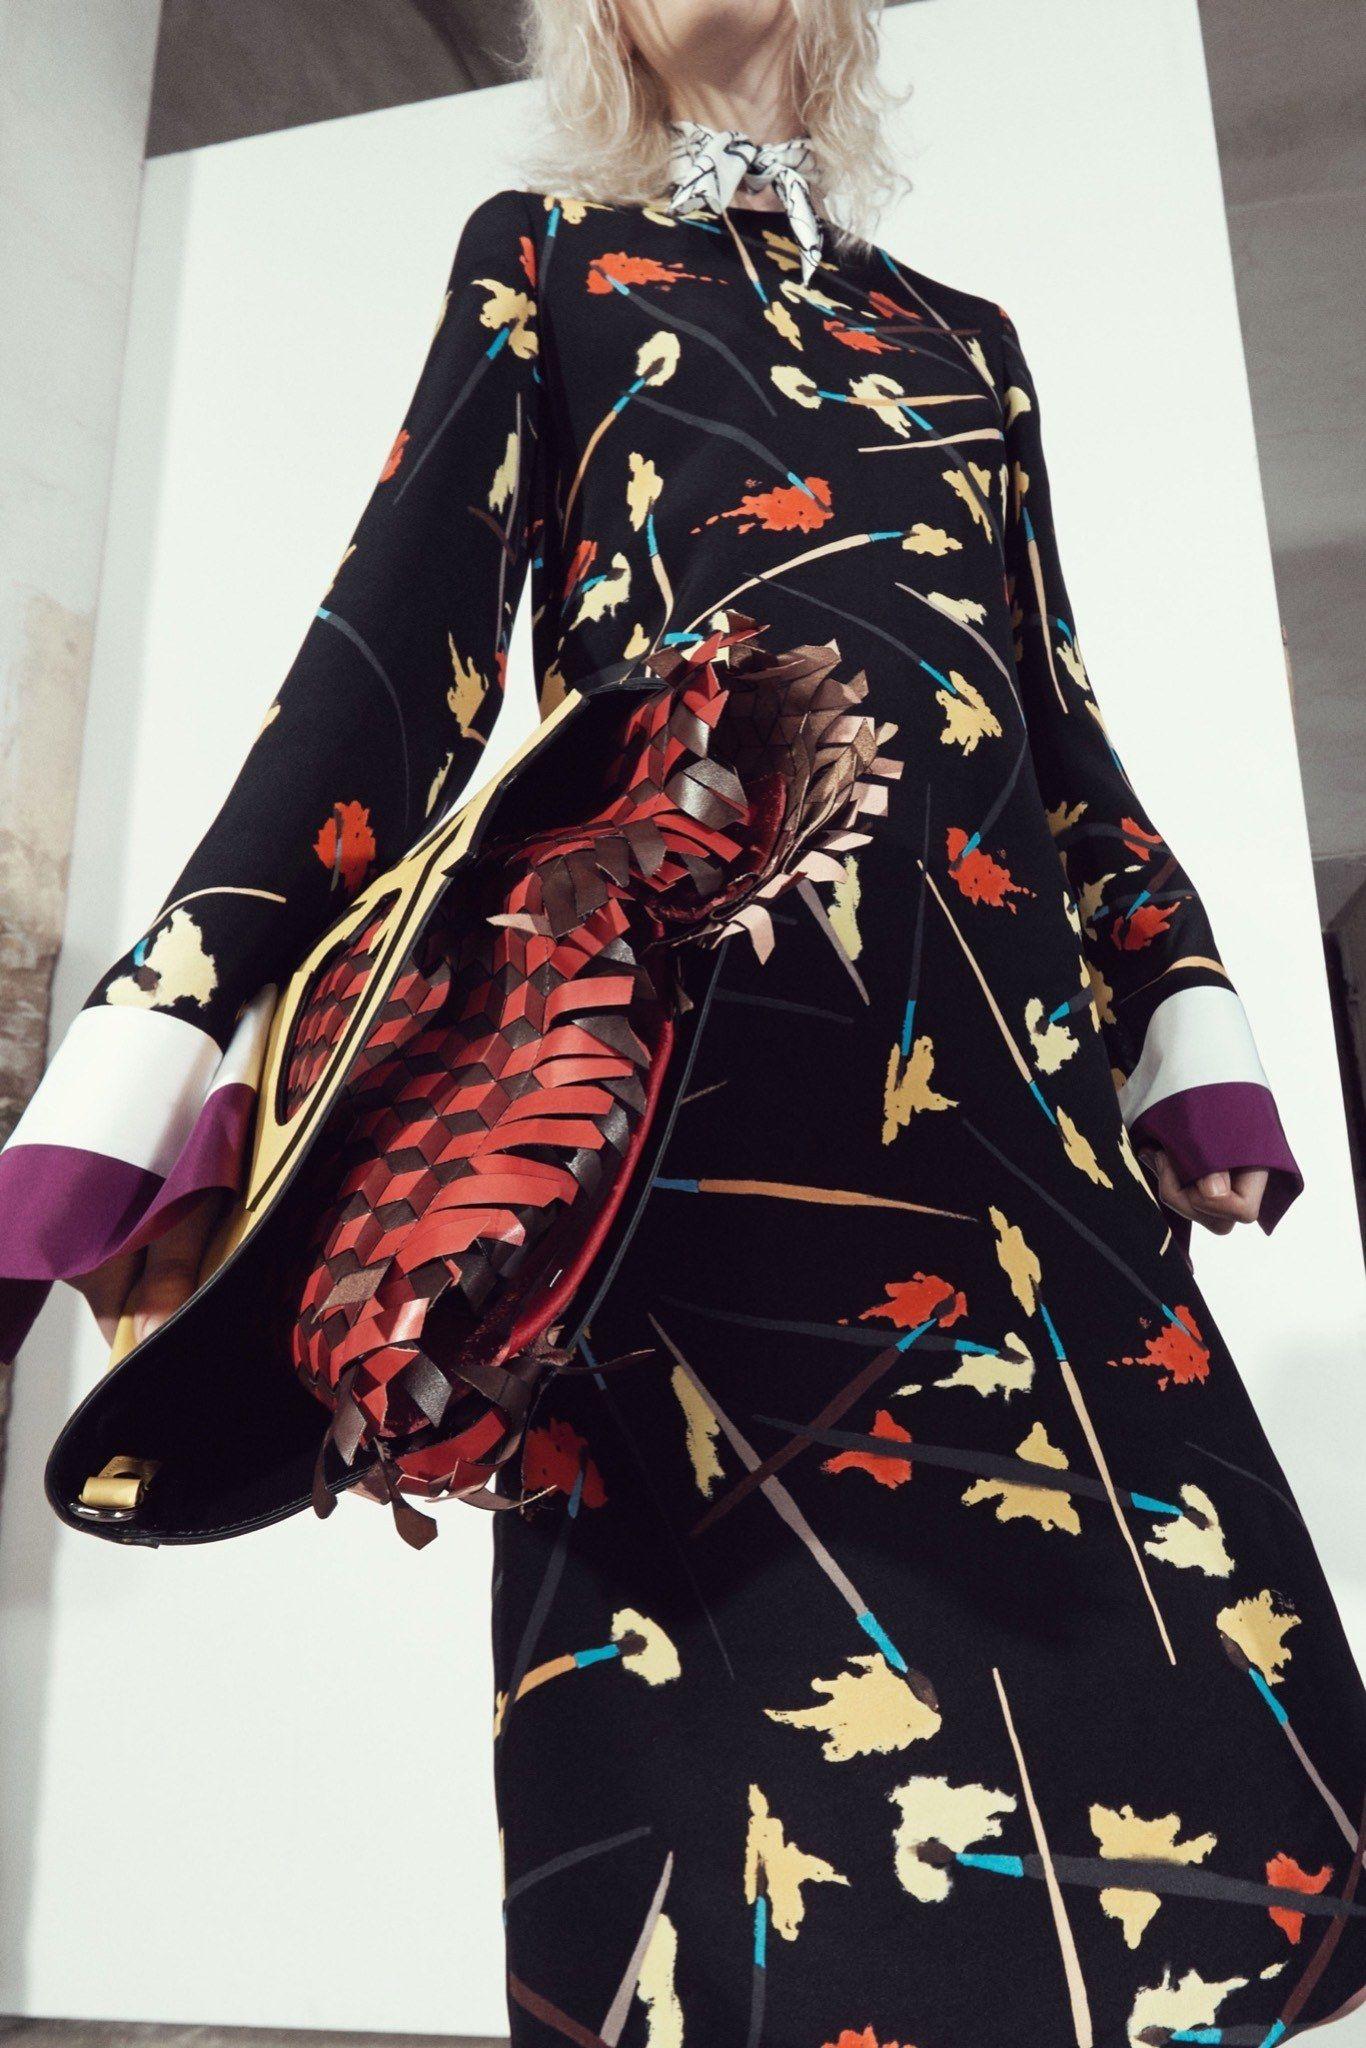 Emilio Pucci Resort 2016 Collection Photos - Vogue